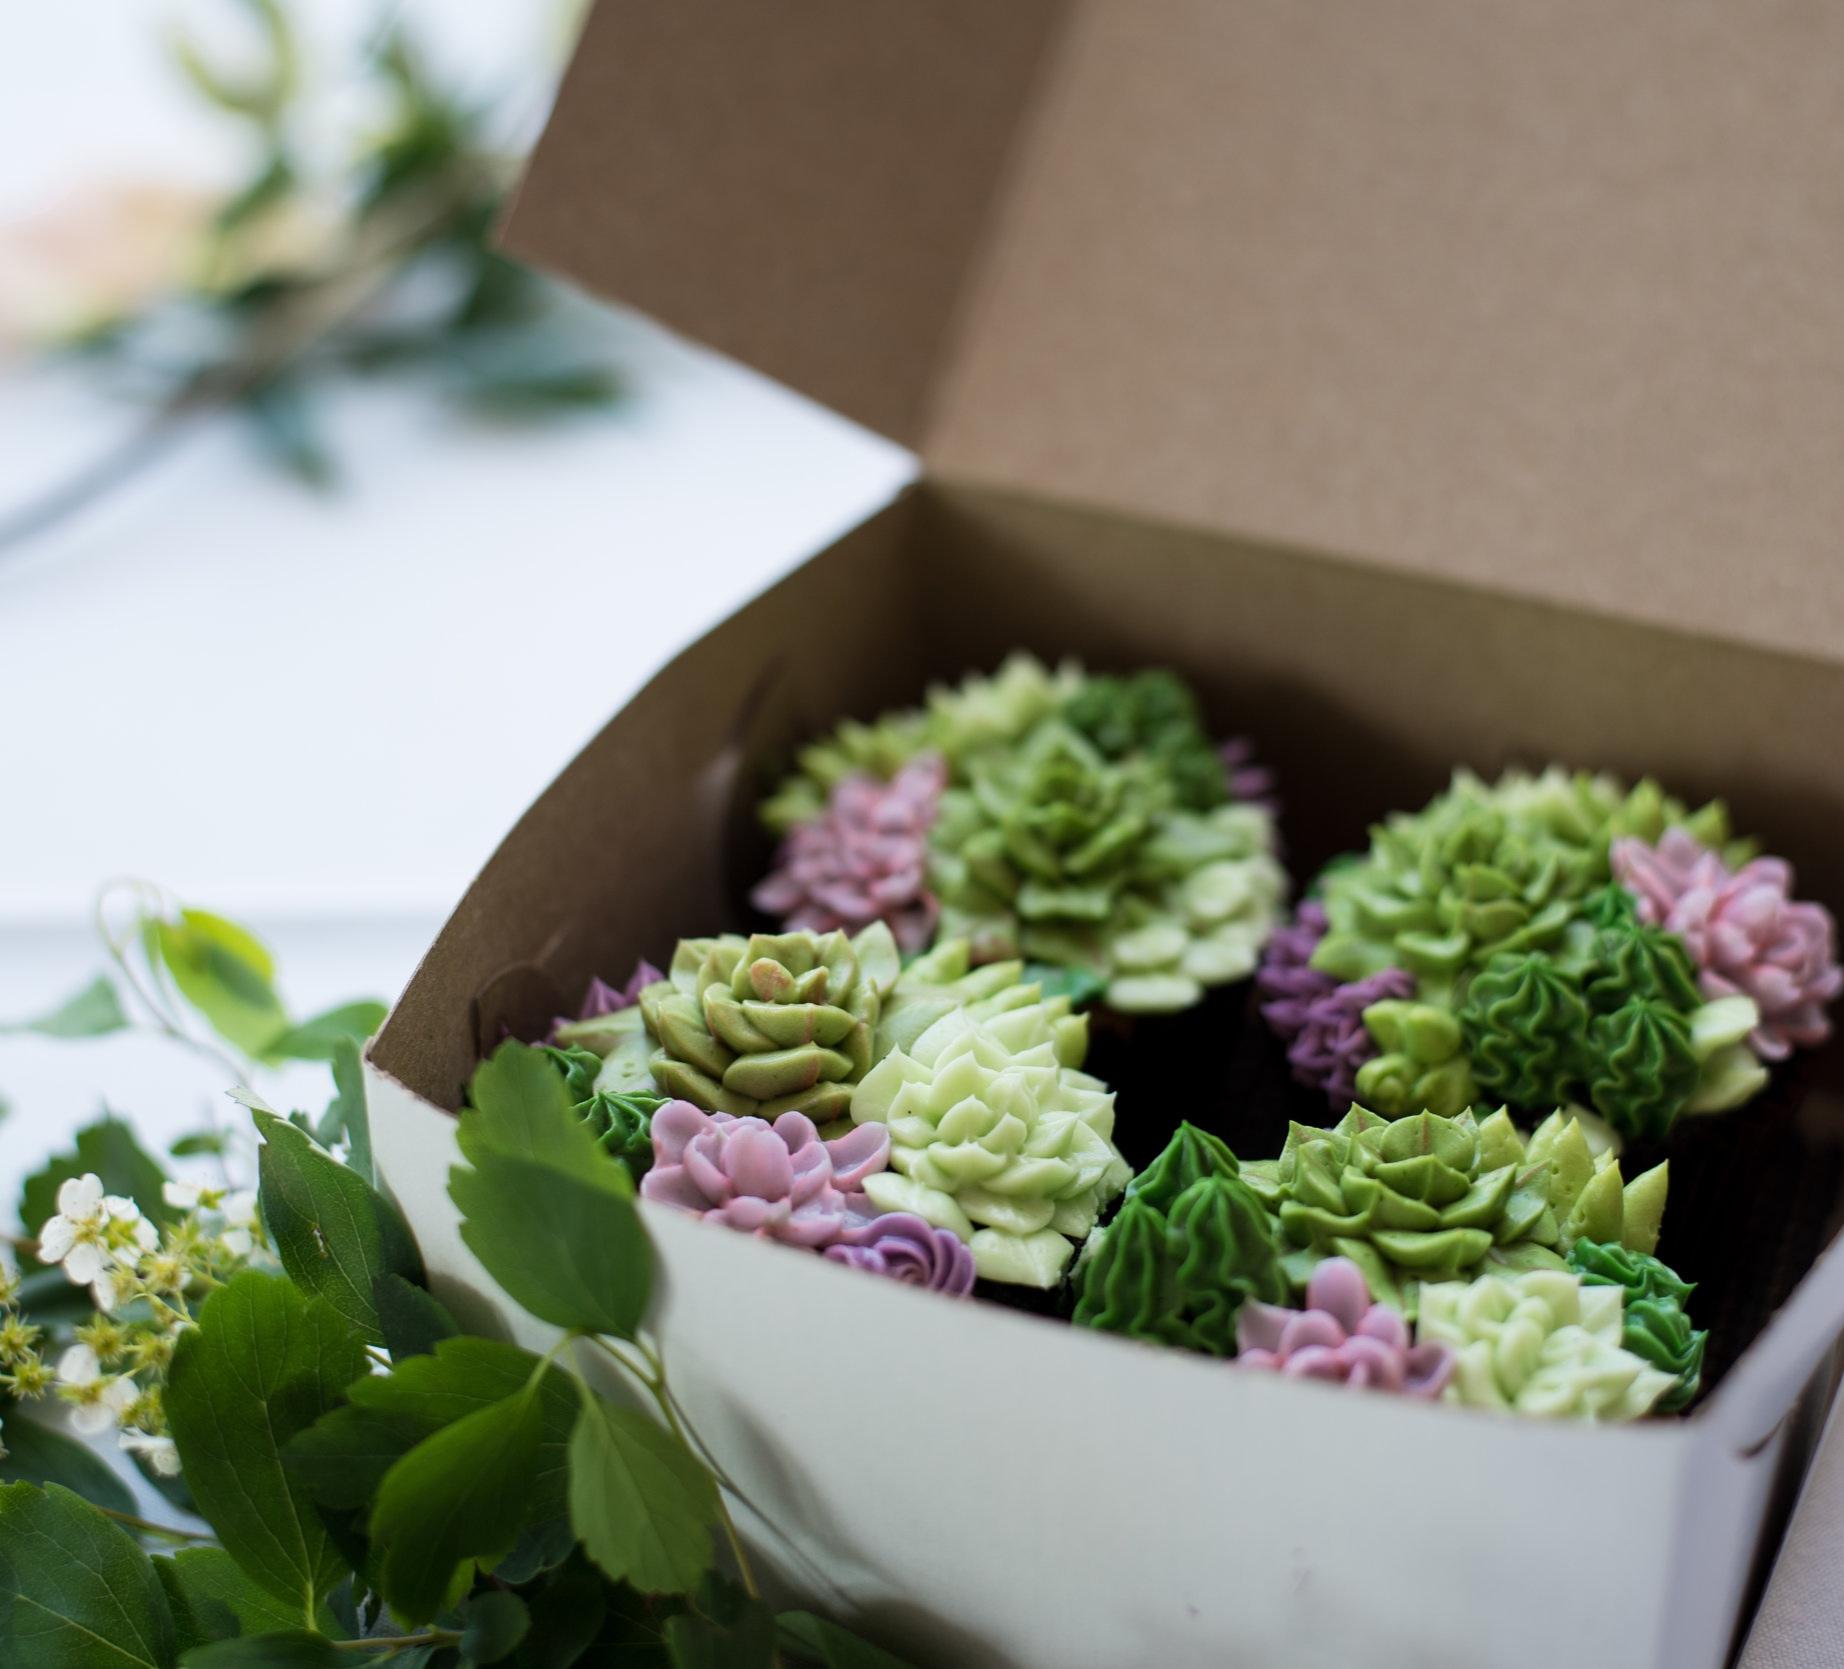 Cupcakes London Ontario | Bake Shop Studio